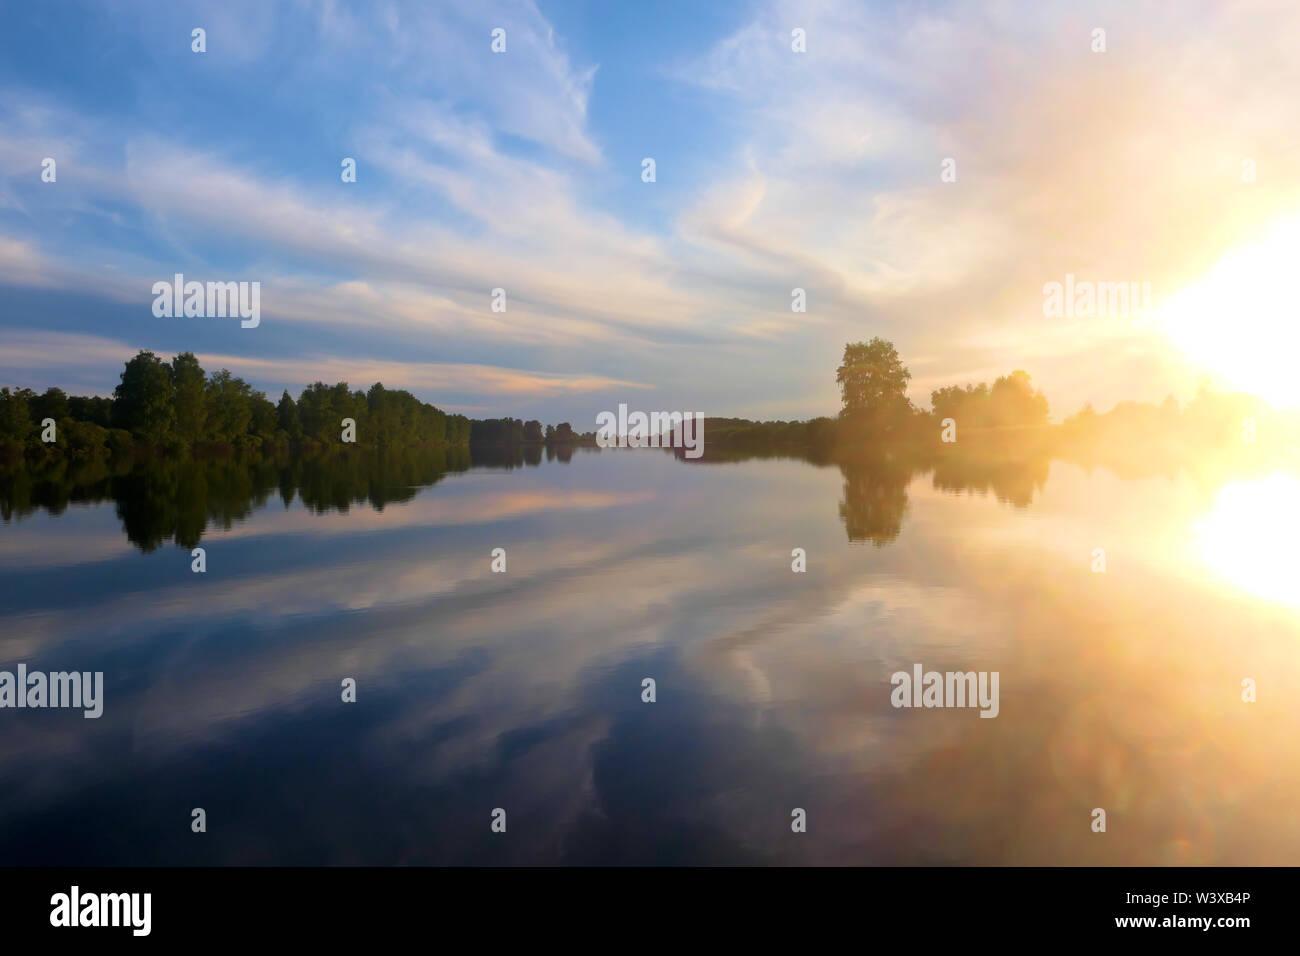 Bright beautiful sunset over lake - Stock Image